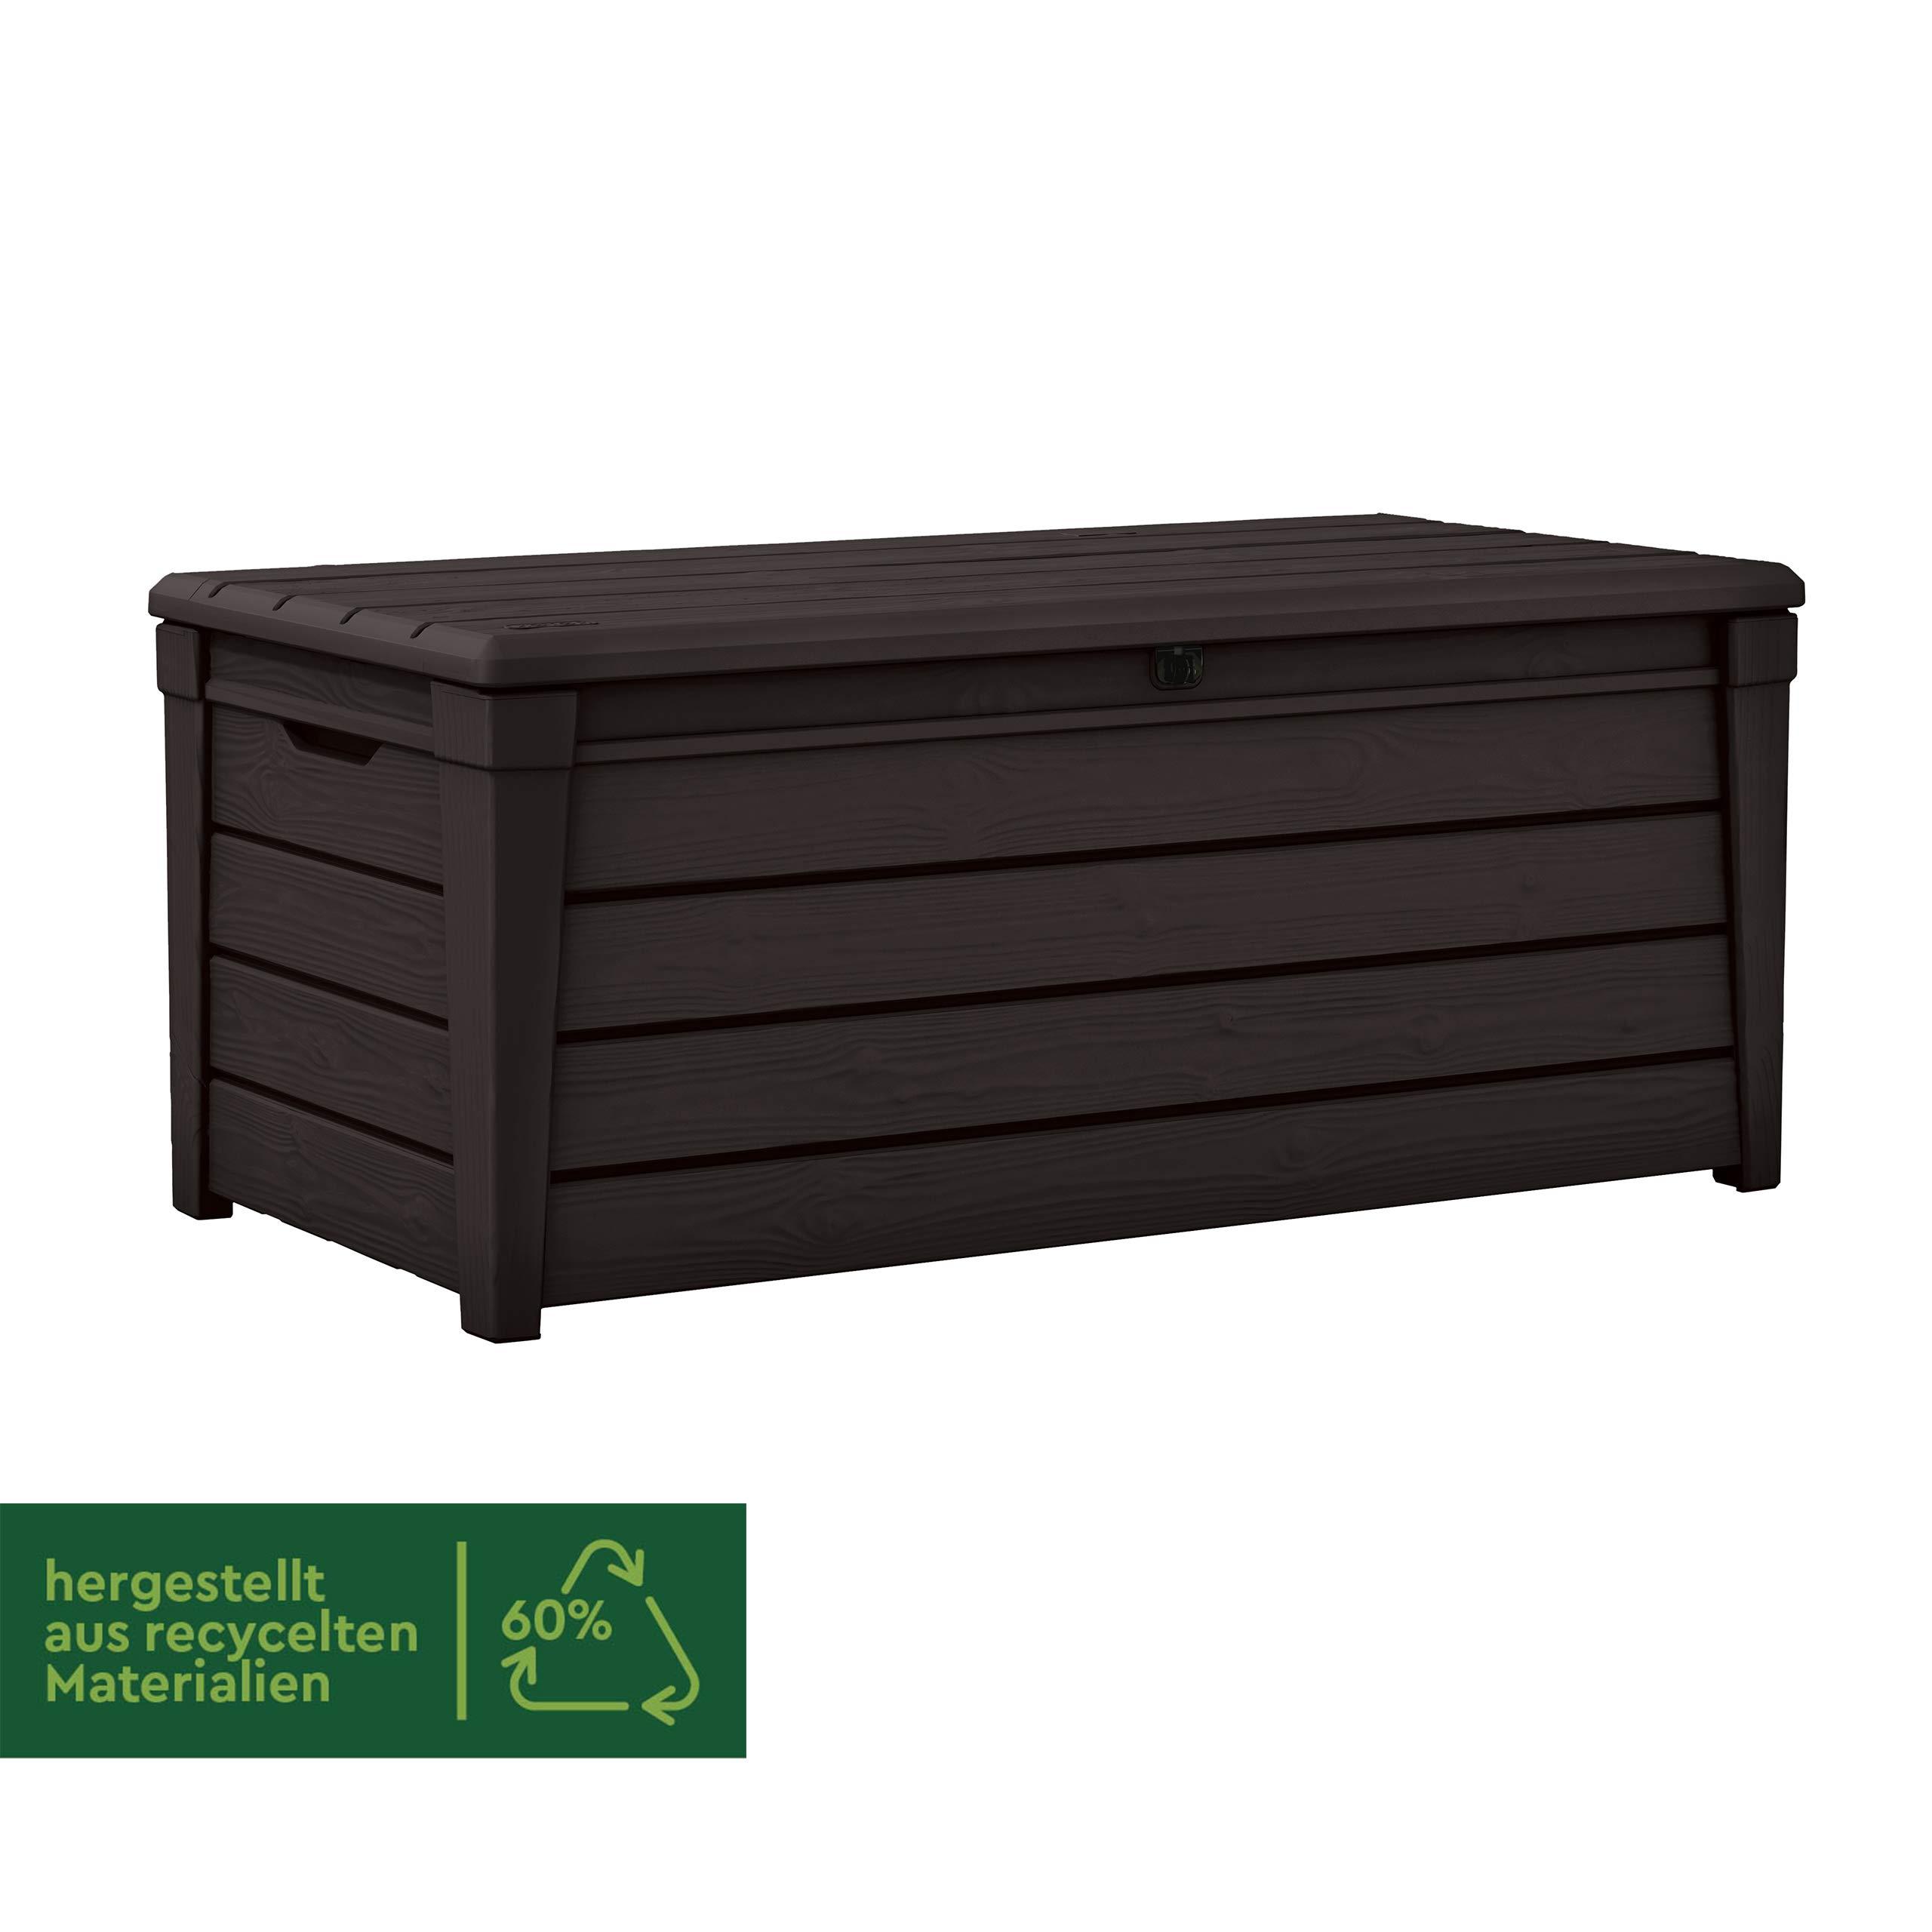 Keter Caja de almacenaje Brightwood: Amazon.es: Jardín